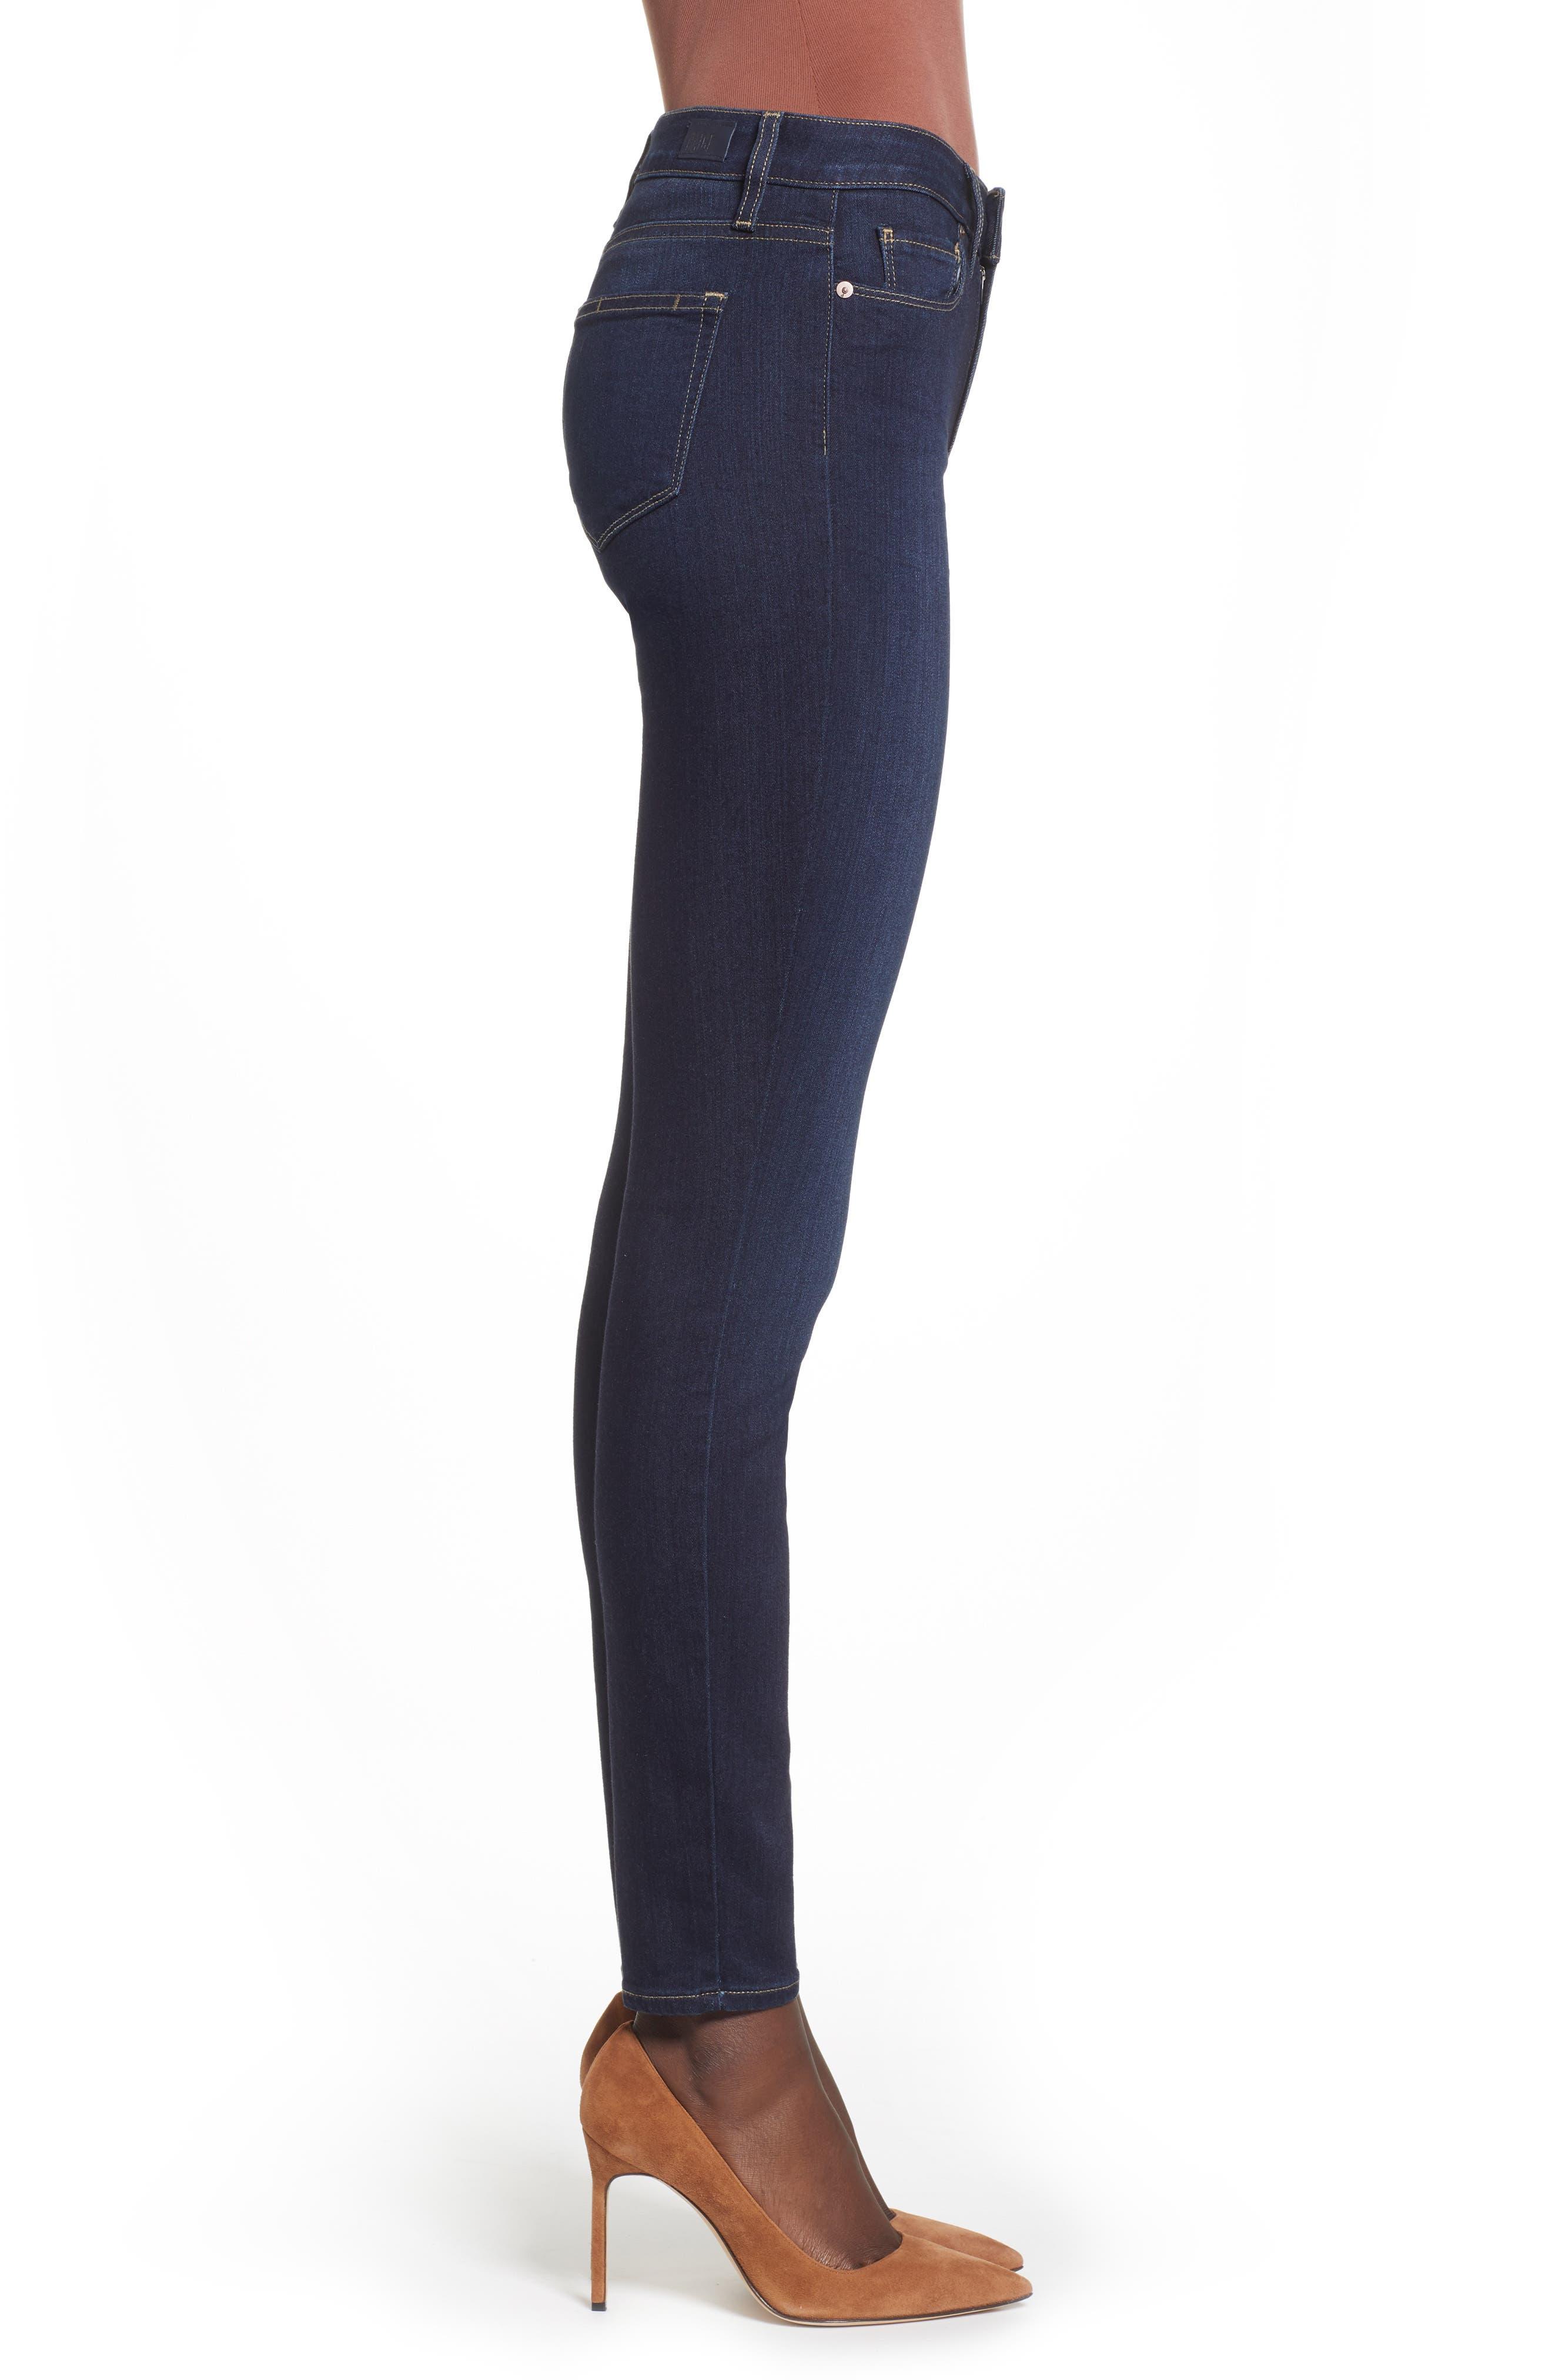 Transcend - Hoxton High Waist Ultra Skinny Jeans,                             Alternate thumbnail 3, color,                             SANIA